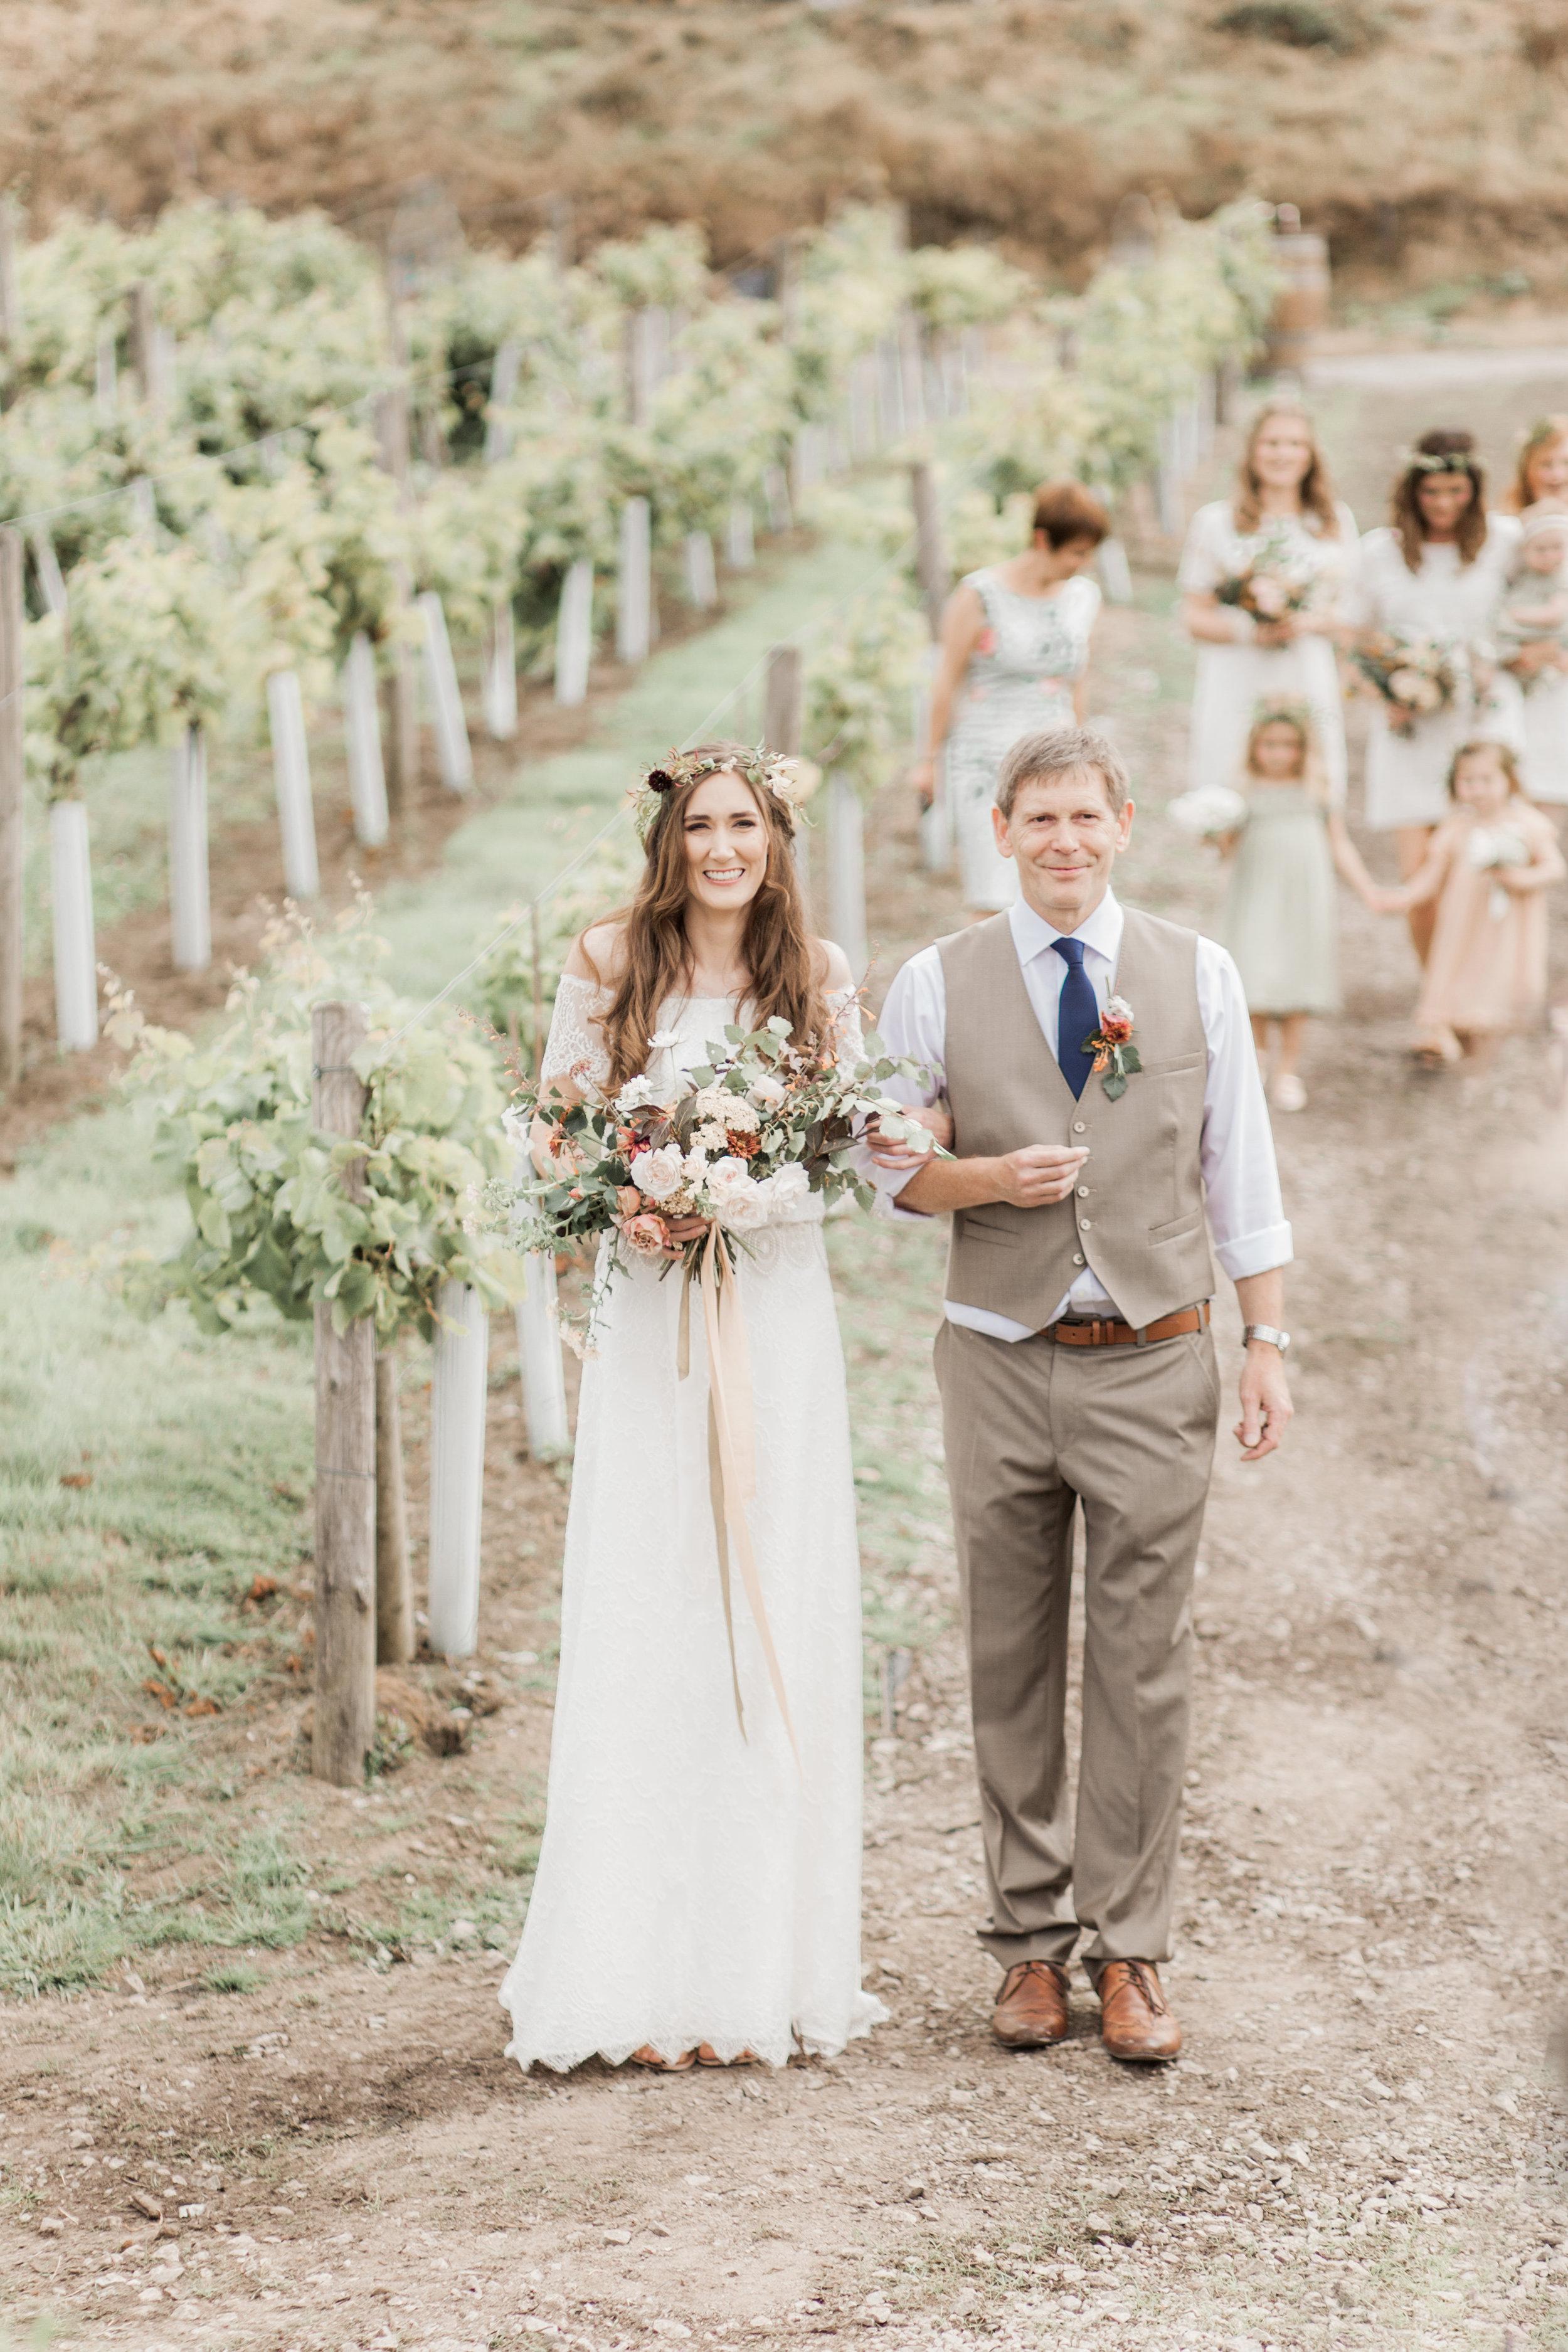 Bride and bridesmaids walking to outdoor ceremony